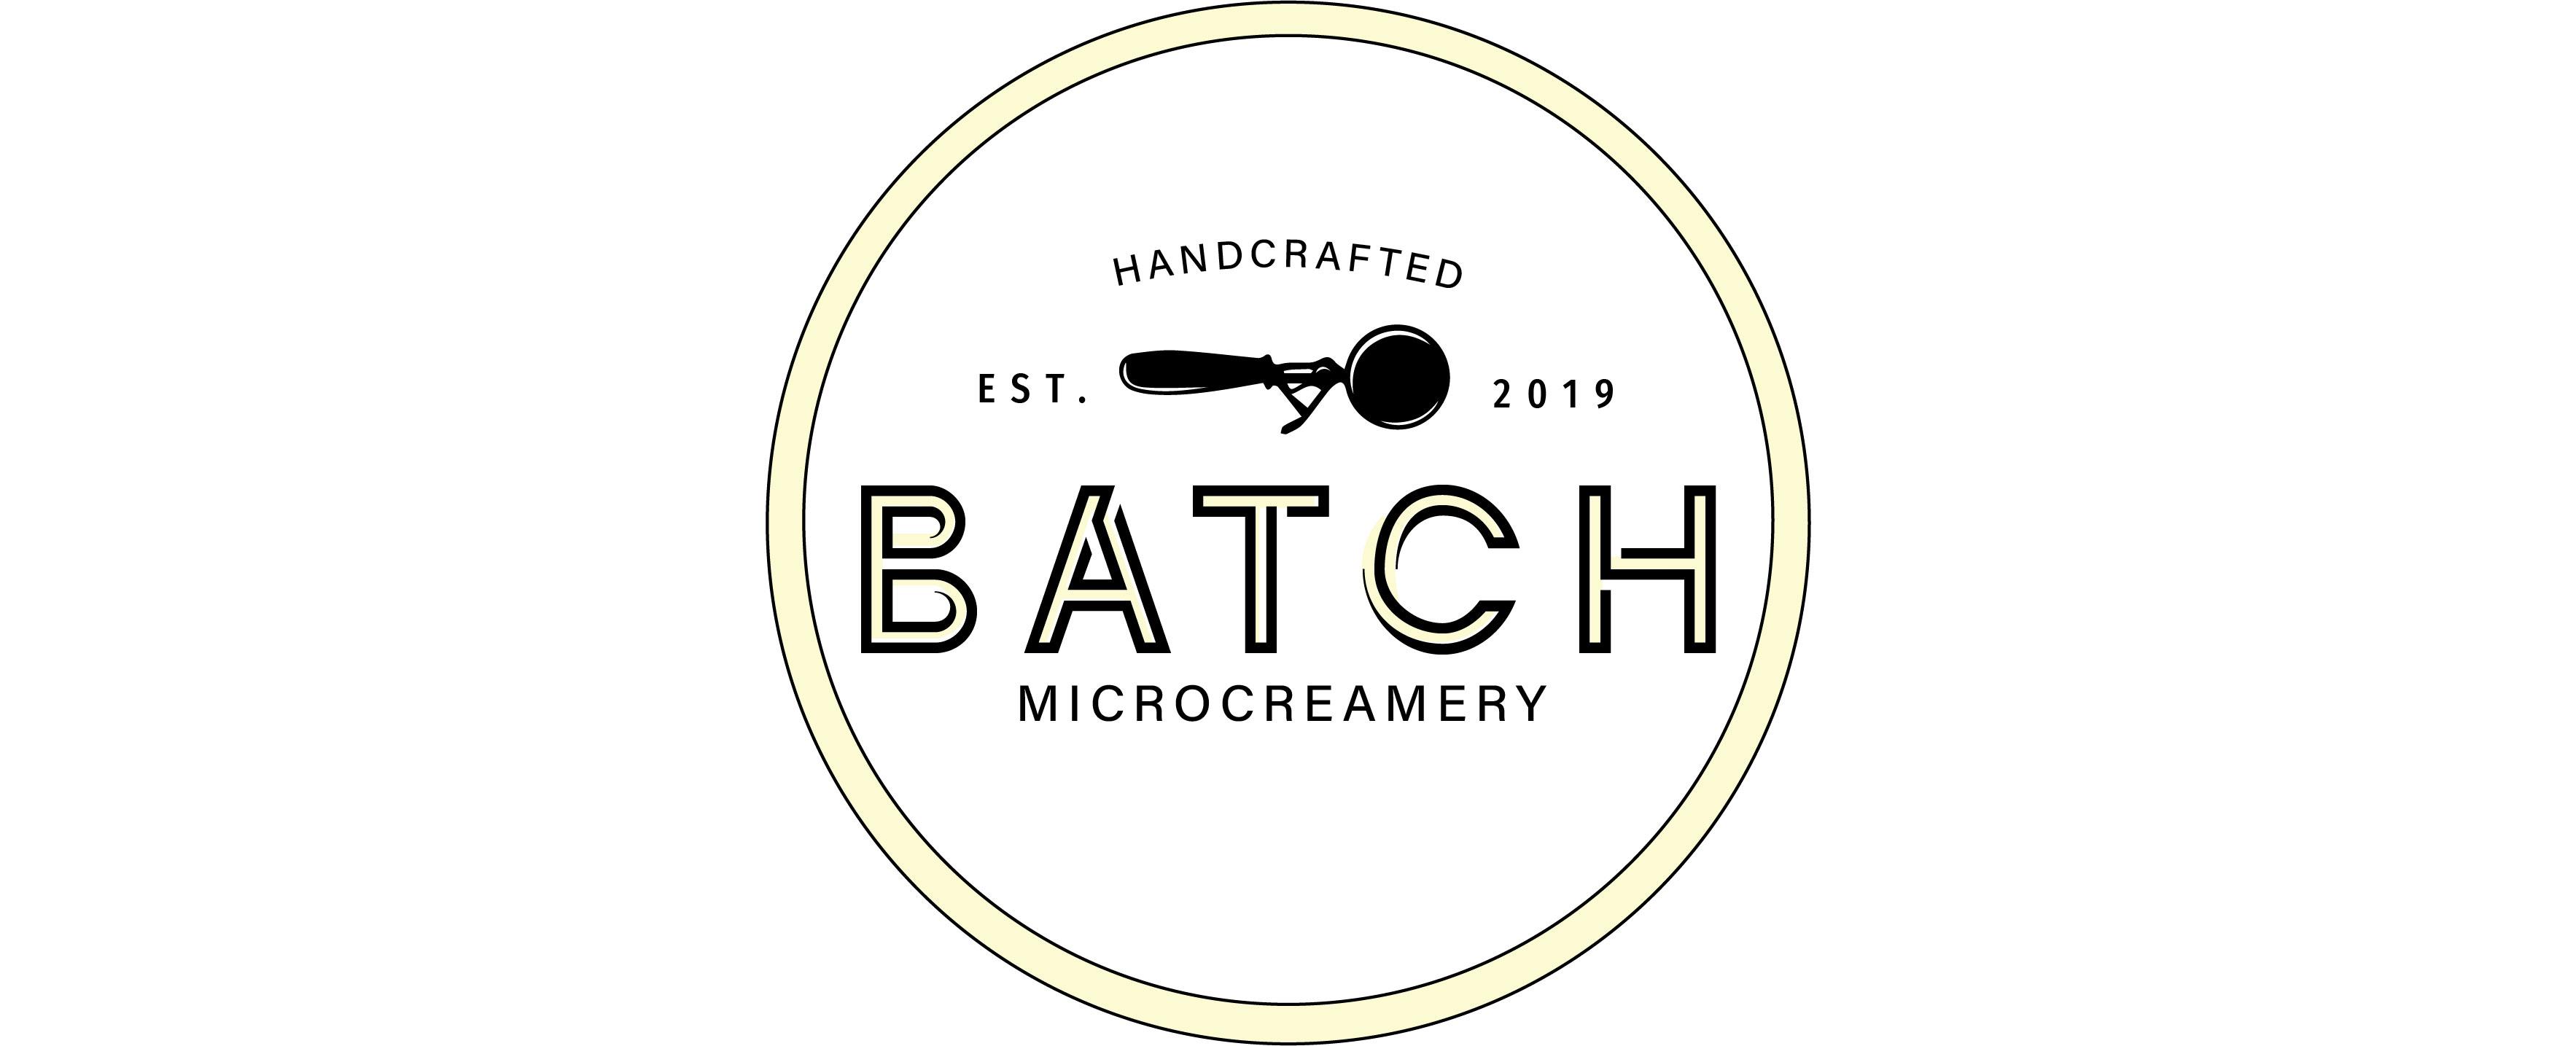 Batch Microcreamery